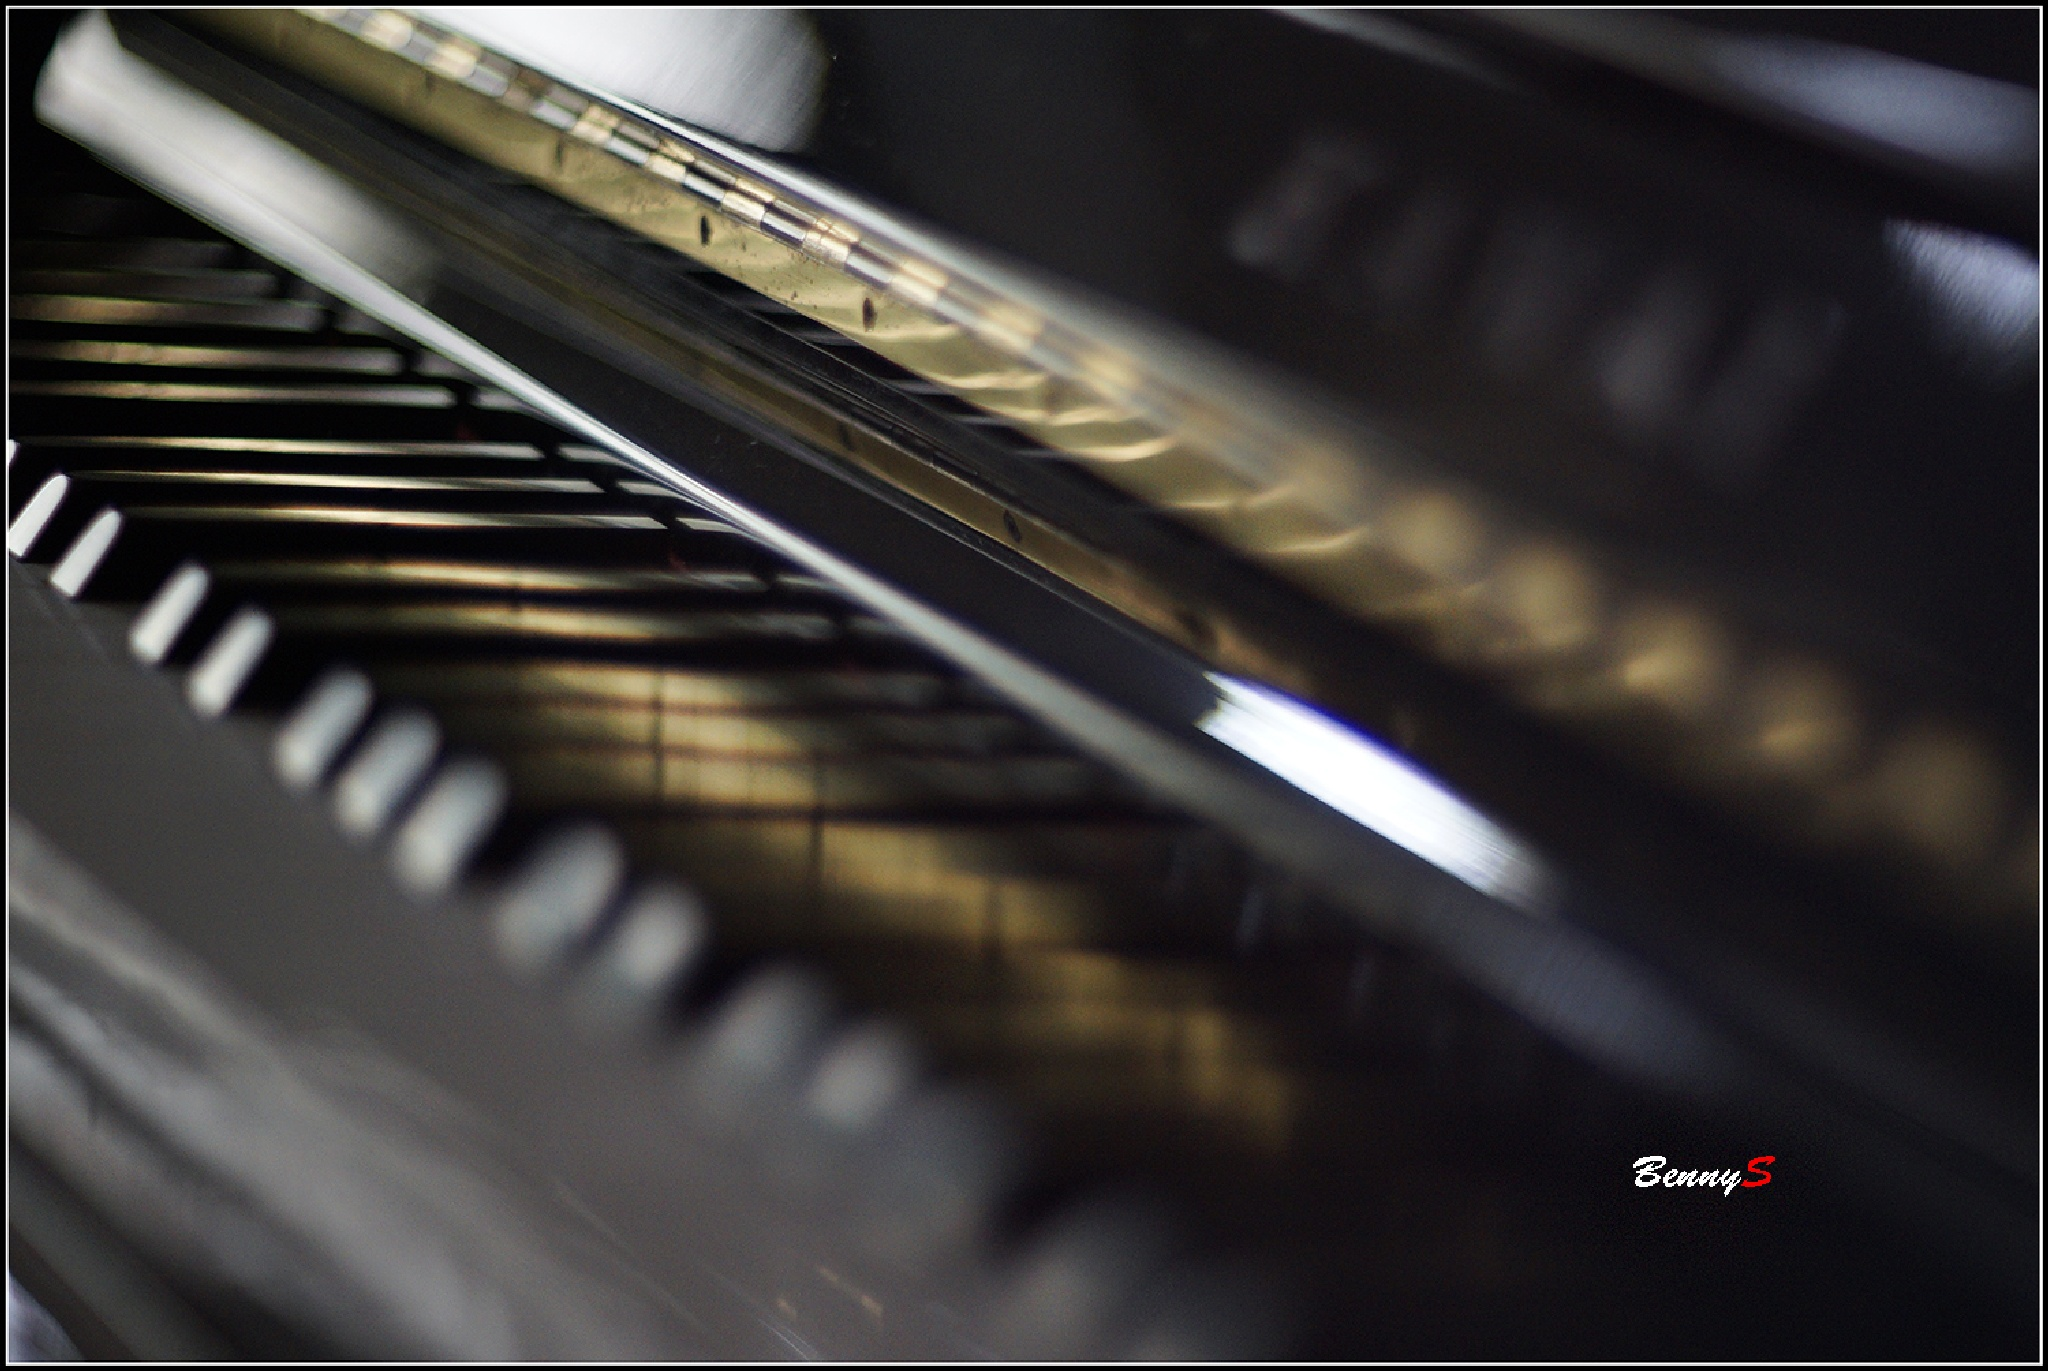 Piano by bennysjafrudin